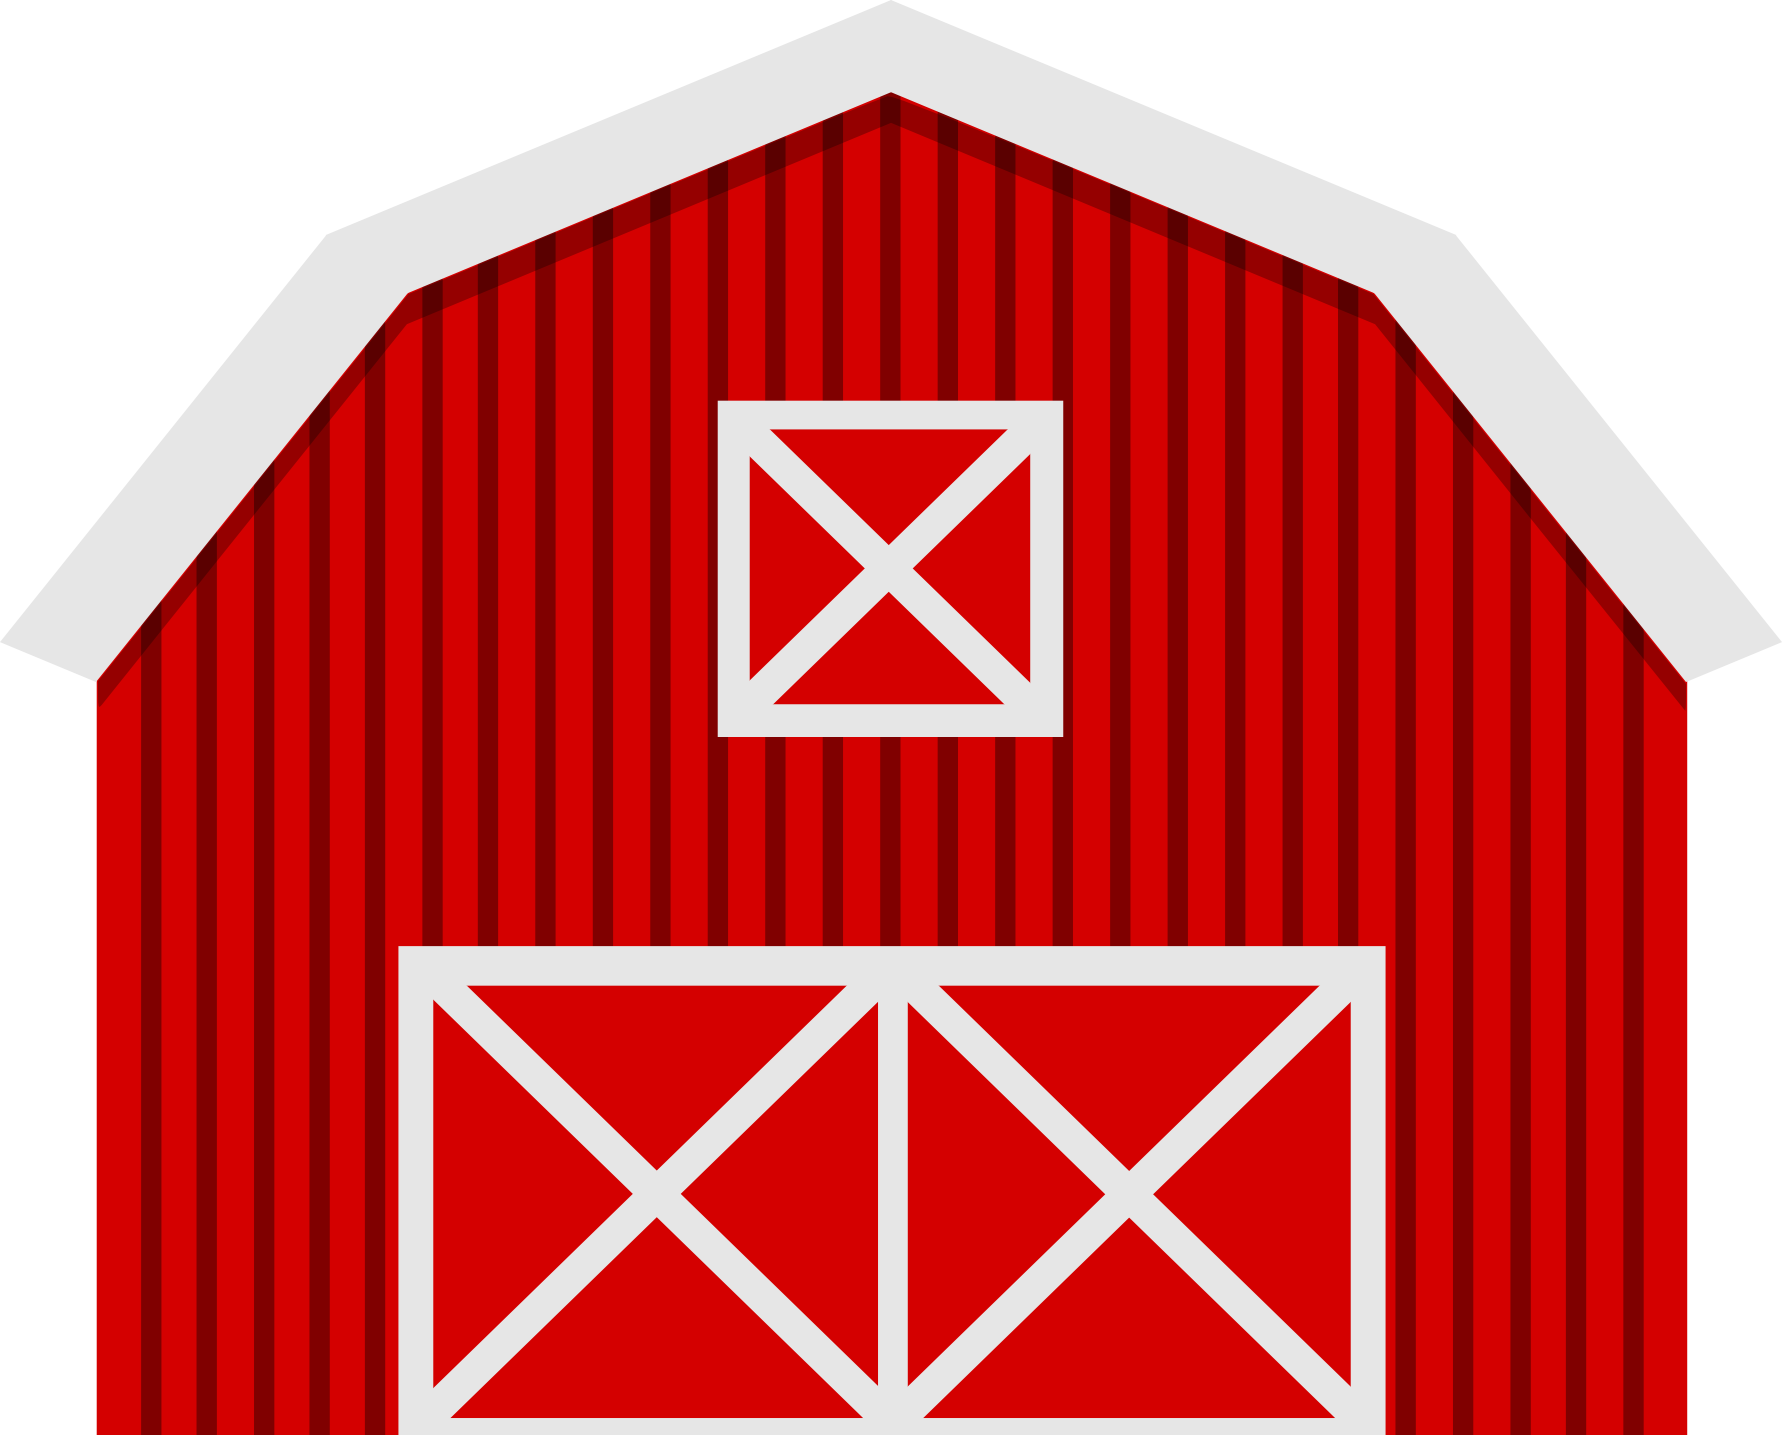 Barn clipart red barn. Chicken lady farms